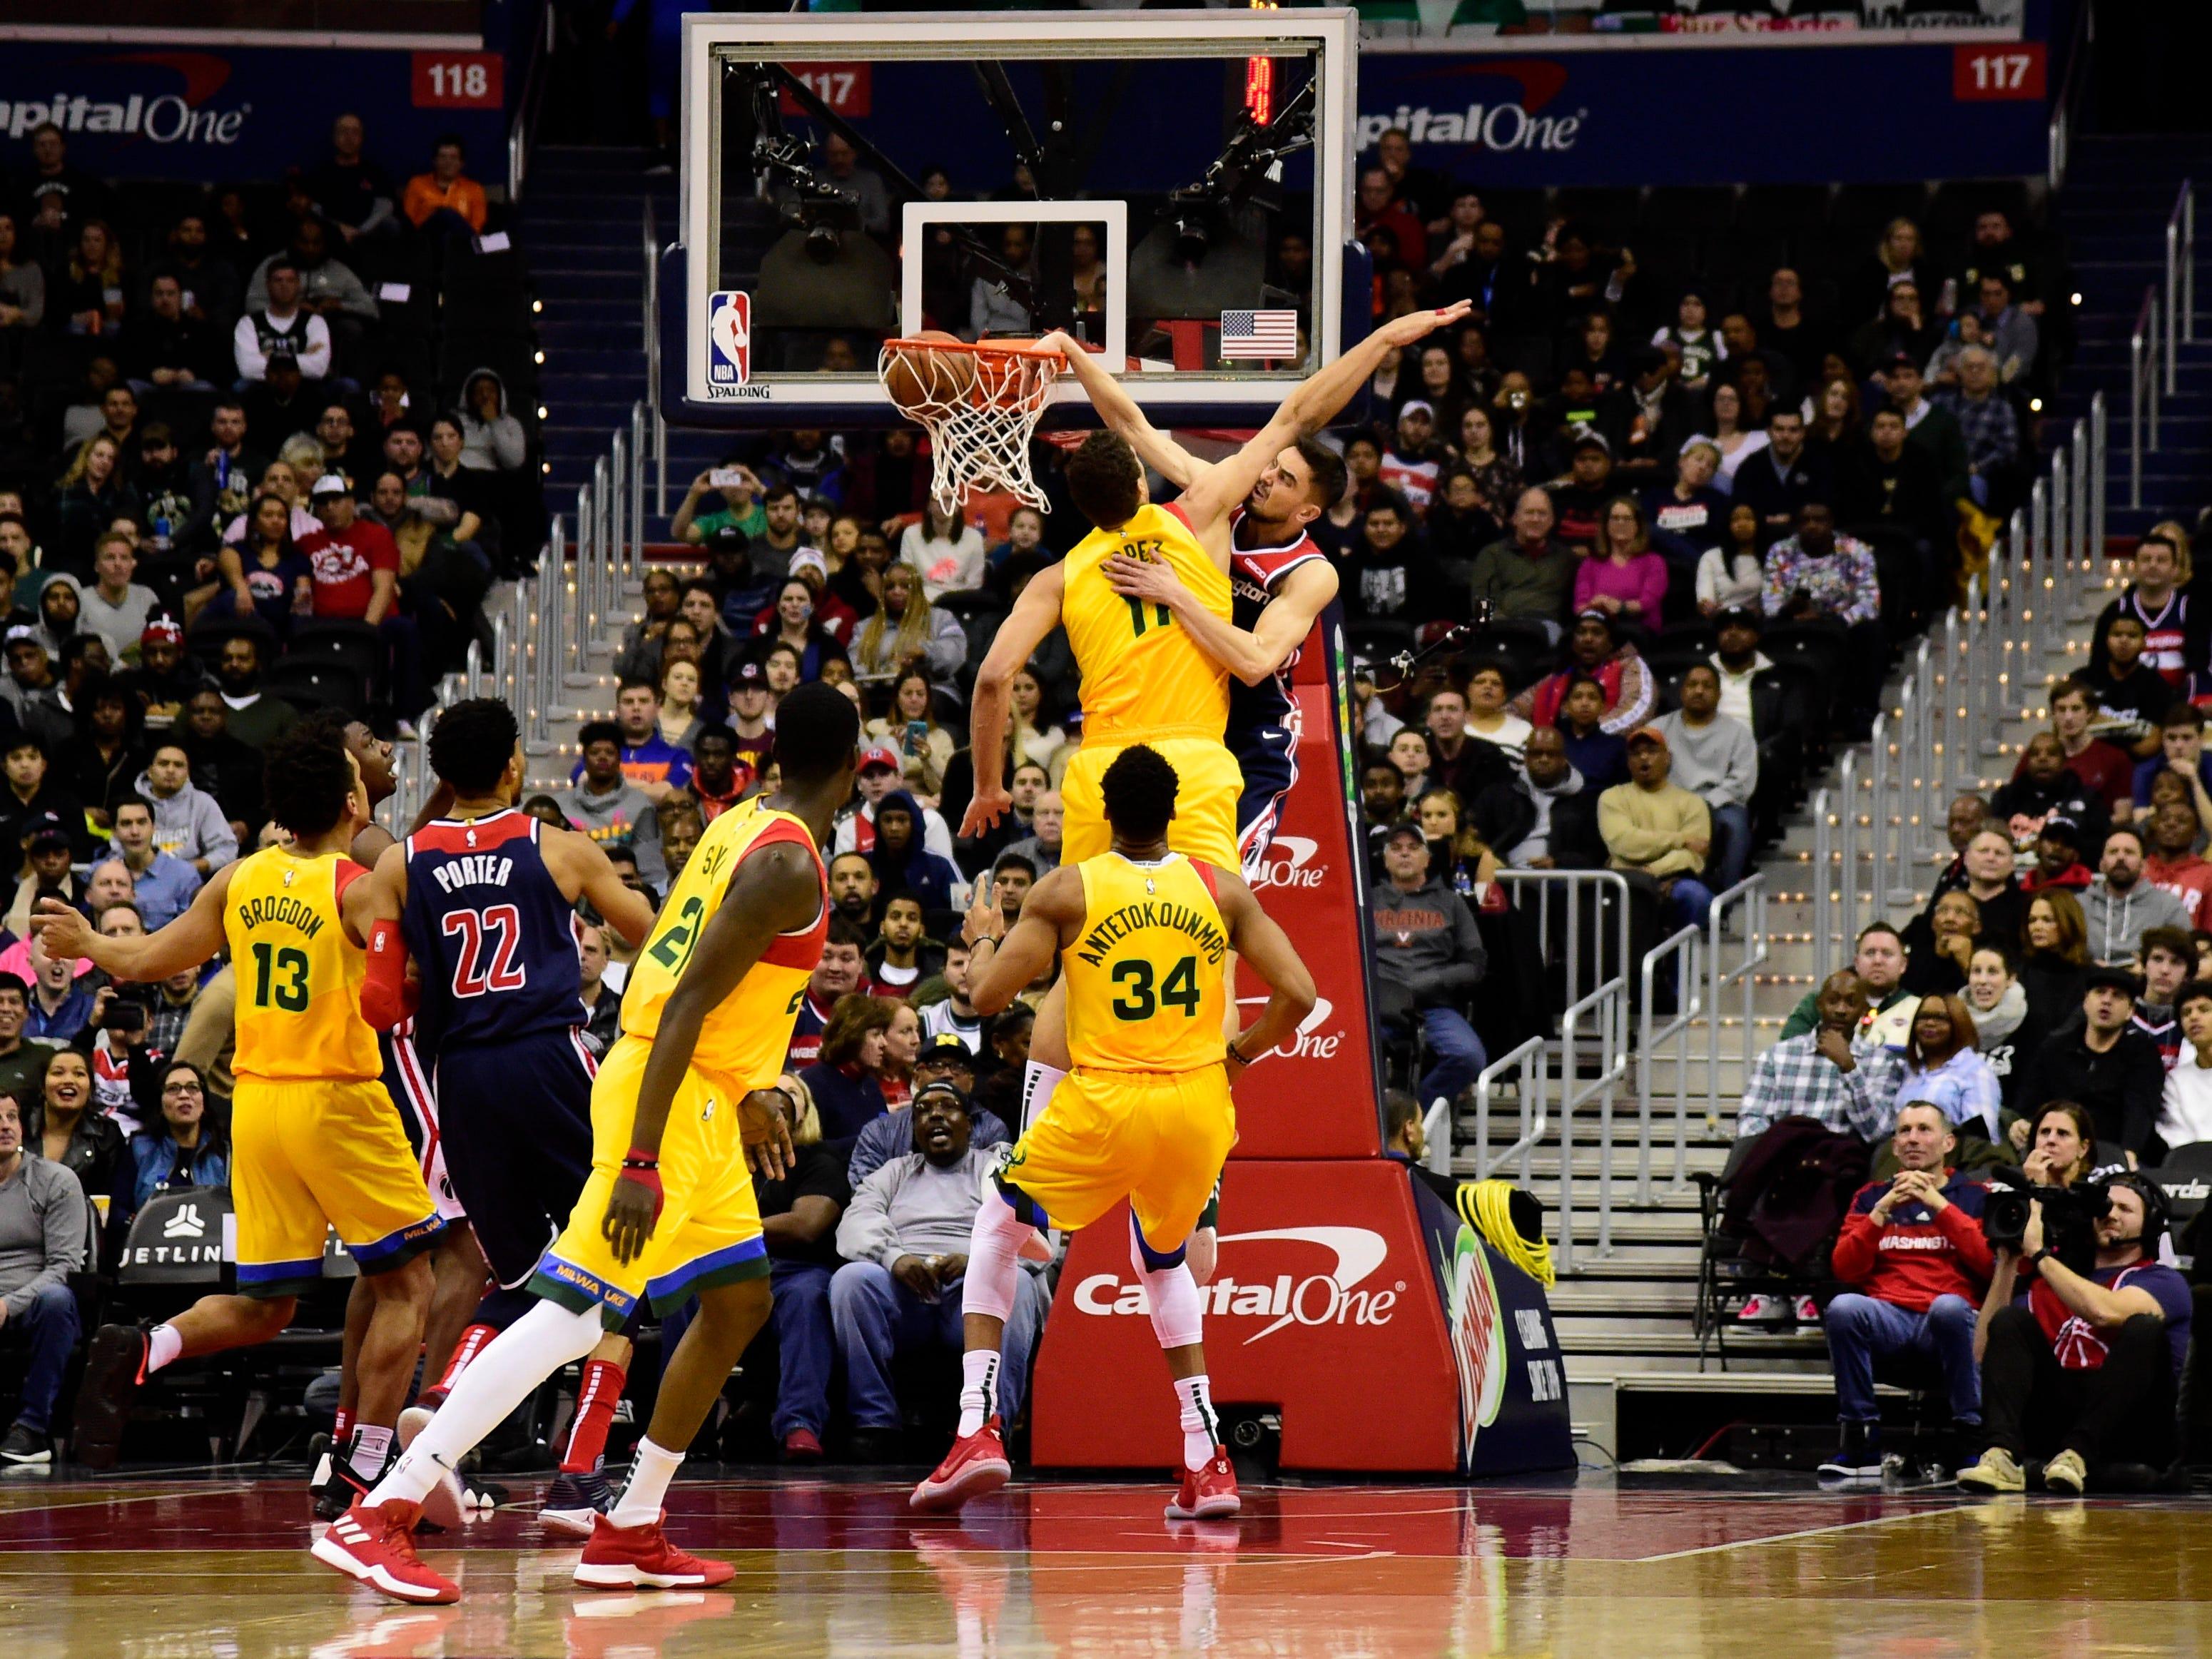 Wizards guard Tomas Satoransky posterizes Bucks center Brook Lopez with a vicious dunk during the first quarter Saturday night.